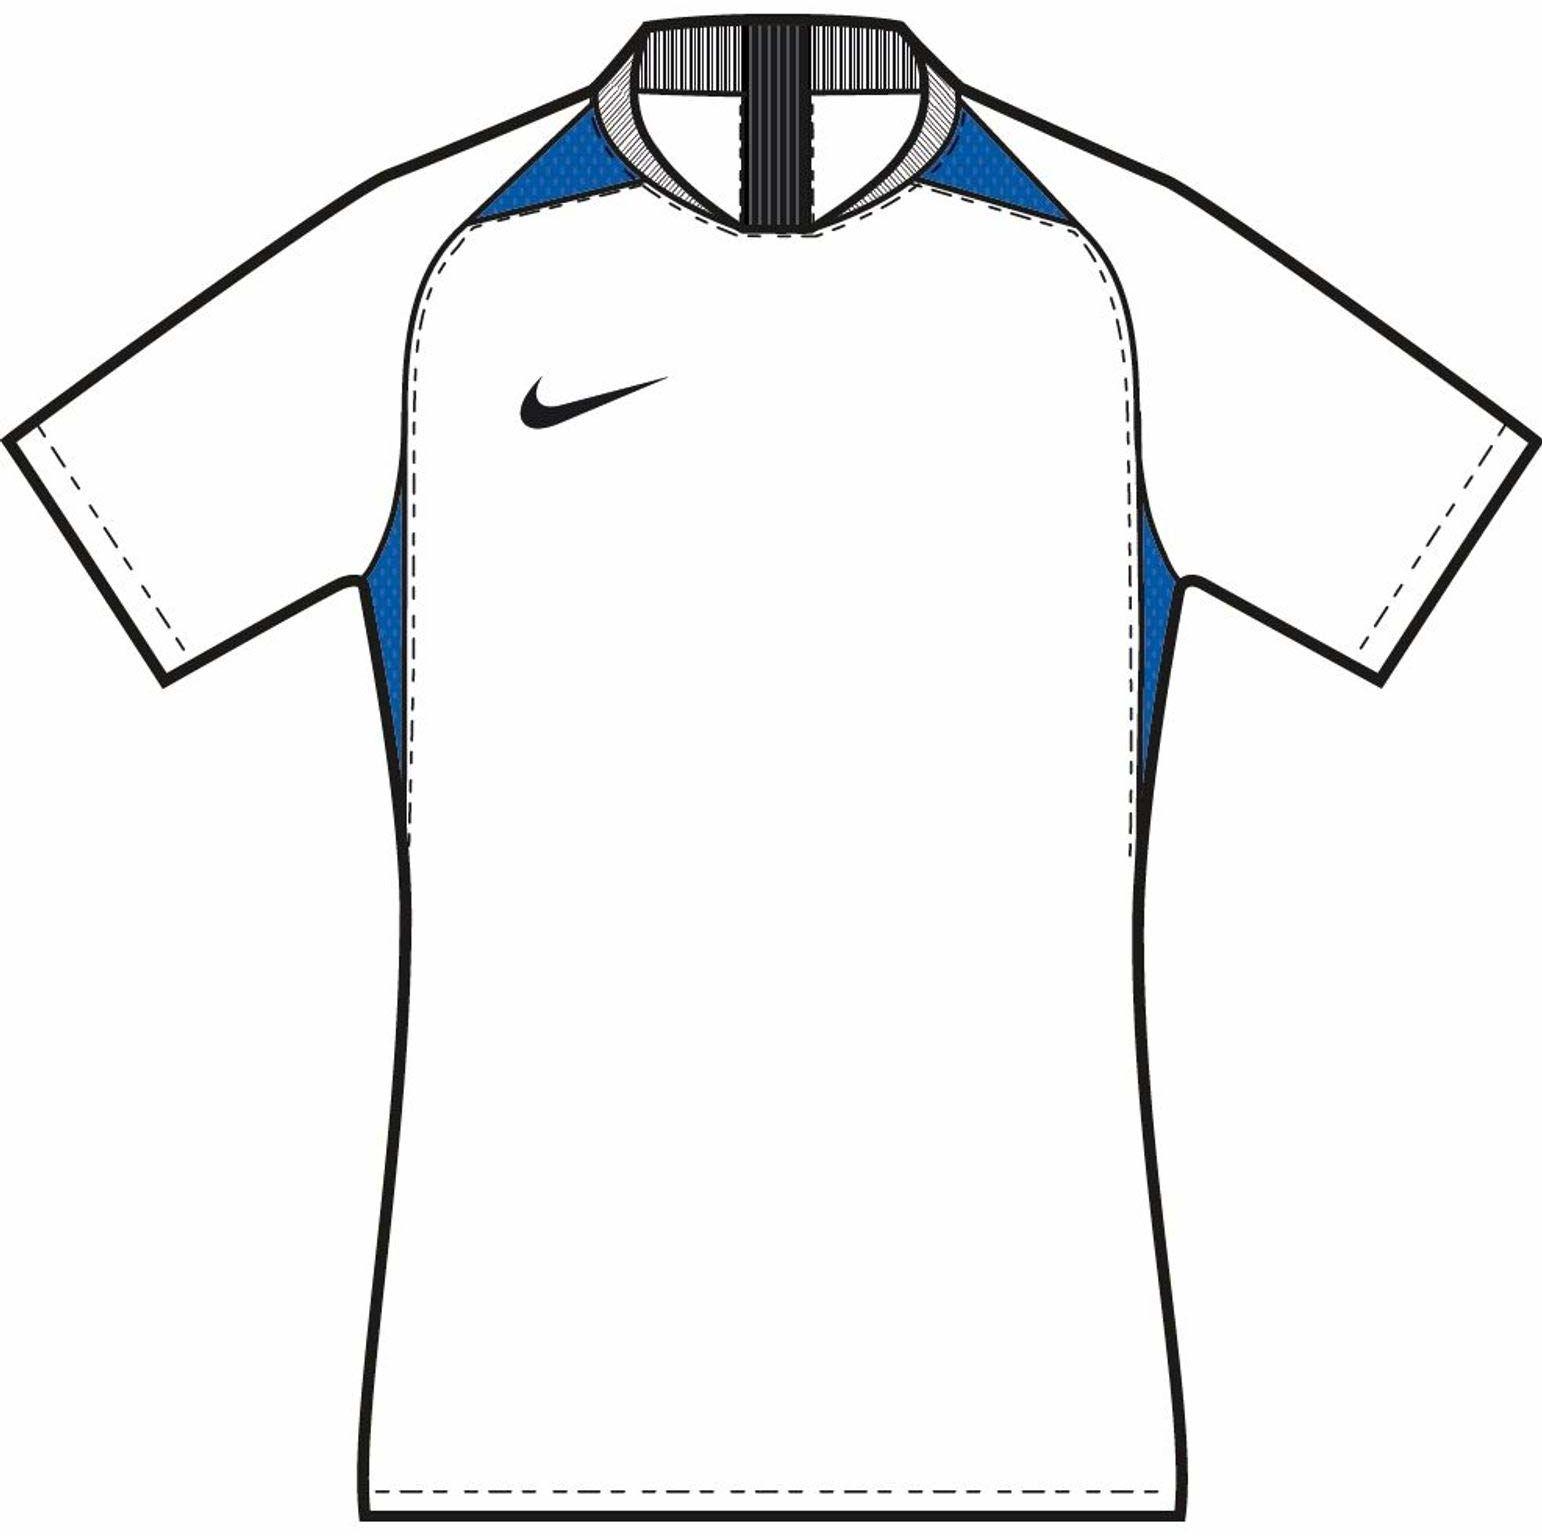 Nike uniseks koszulka legendowa dla dzieci S/S Jersey White/Royal Blue/Black/Black L